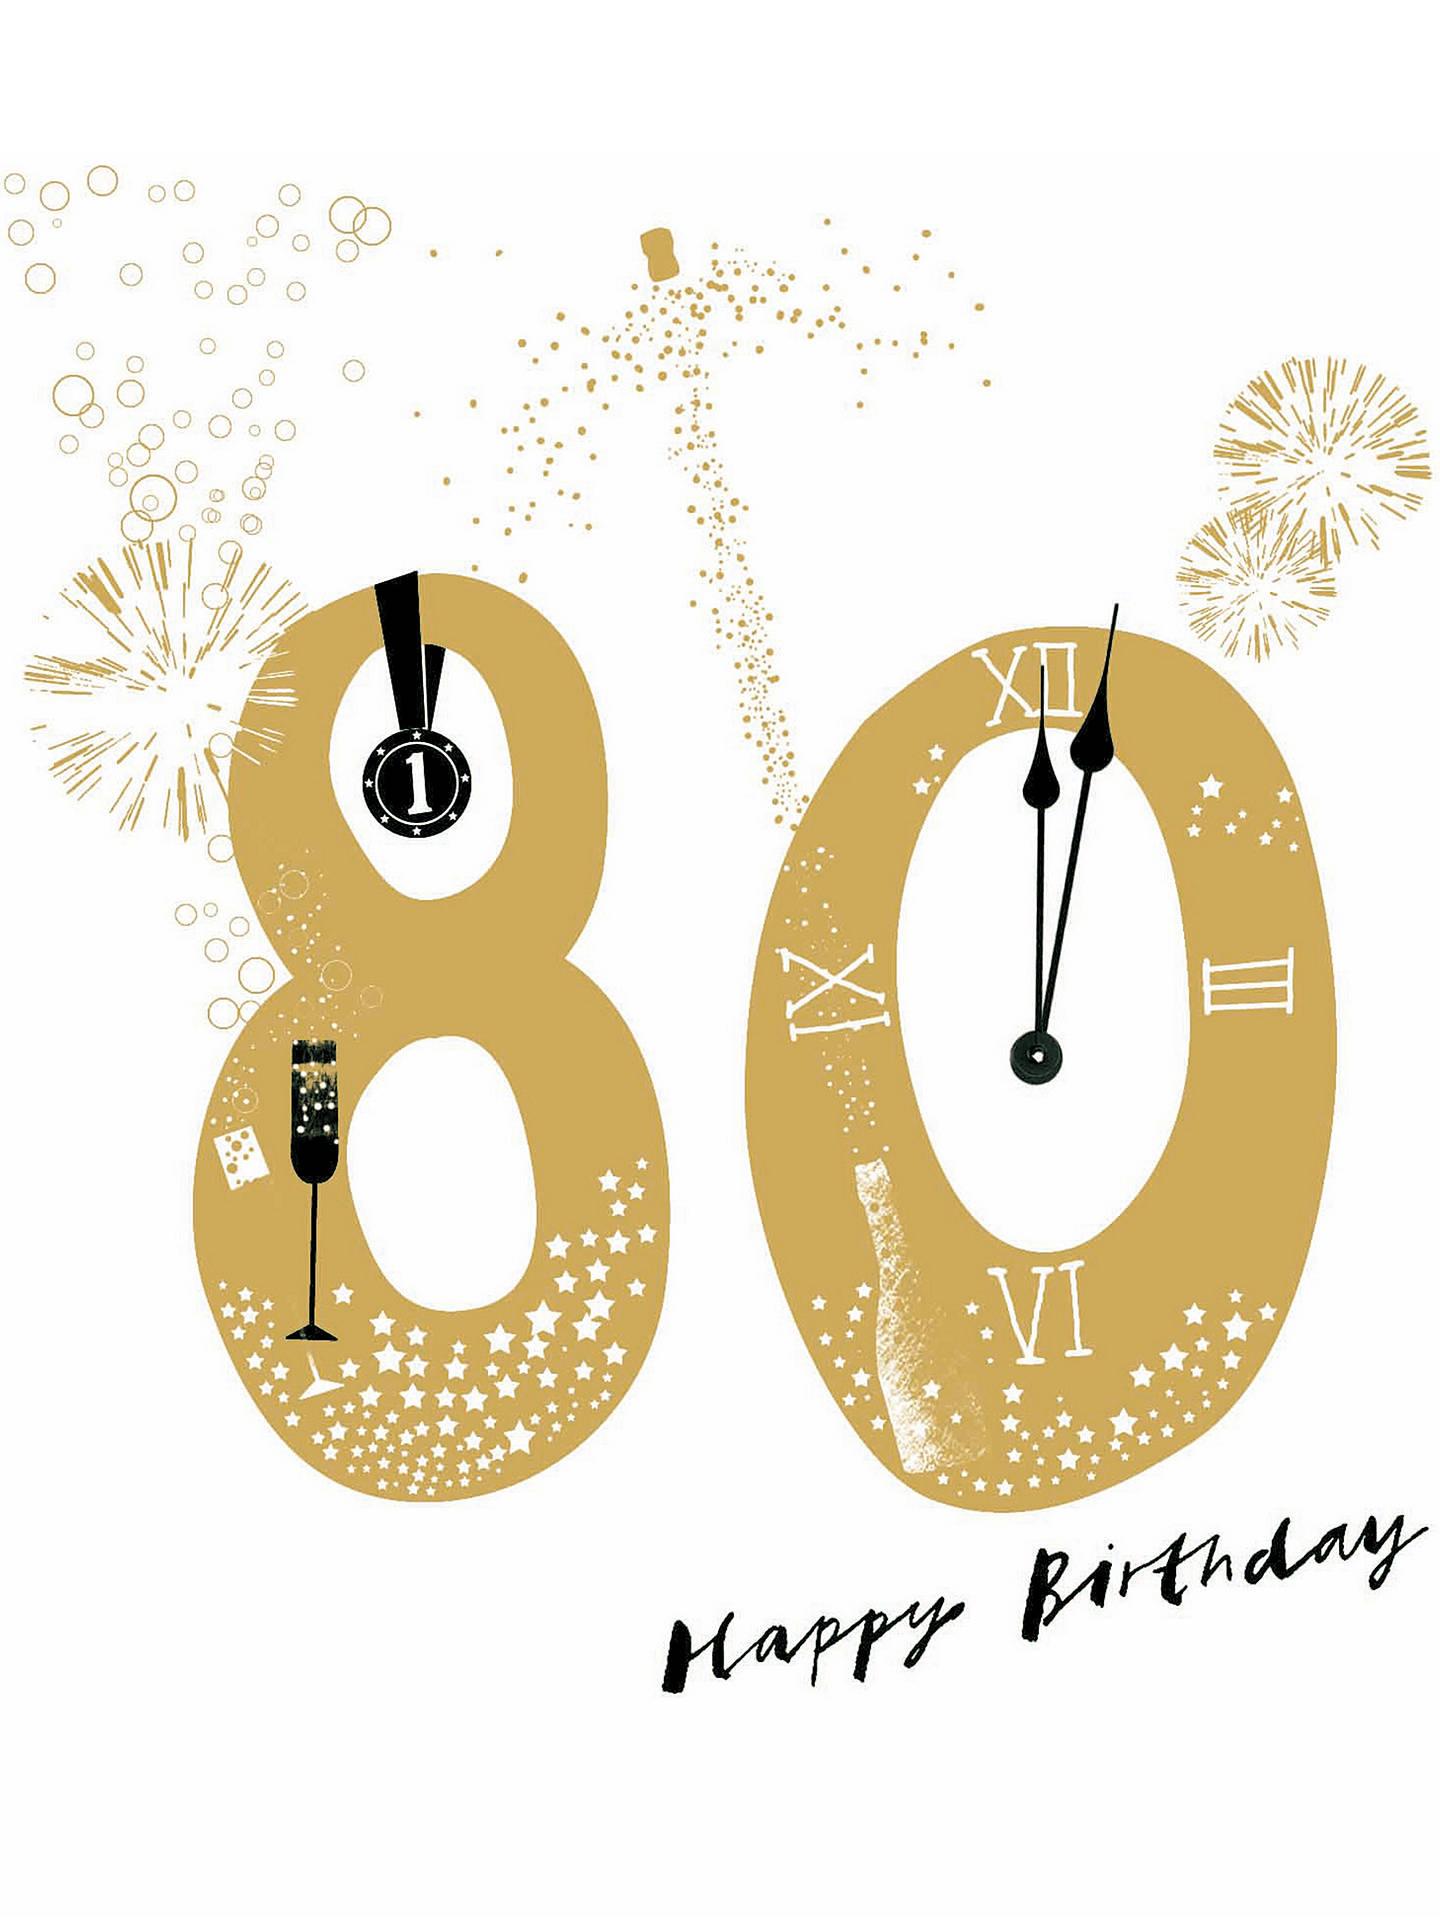 Woodmansterne Joyful 80th Birthday Card At John Lewis Partners